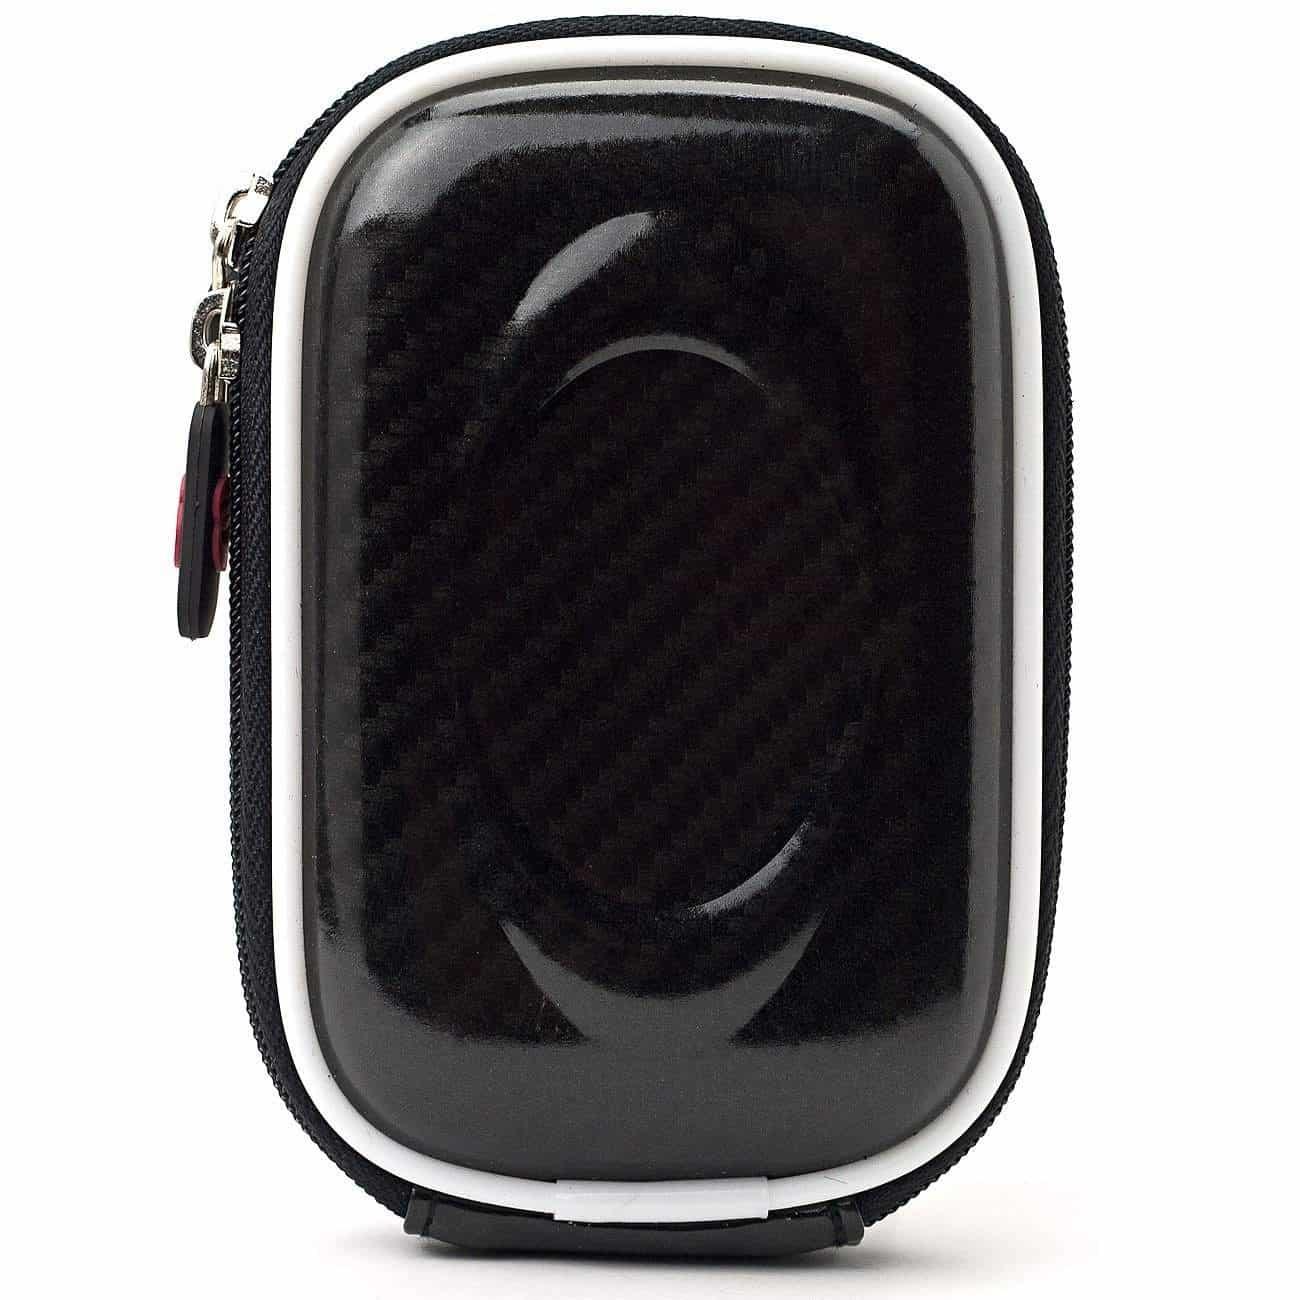 Buy Vangoddy Compact Slim Eva Camera Case For Sony Cyber Shot Dsc W810 W800 Wx350 W830